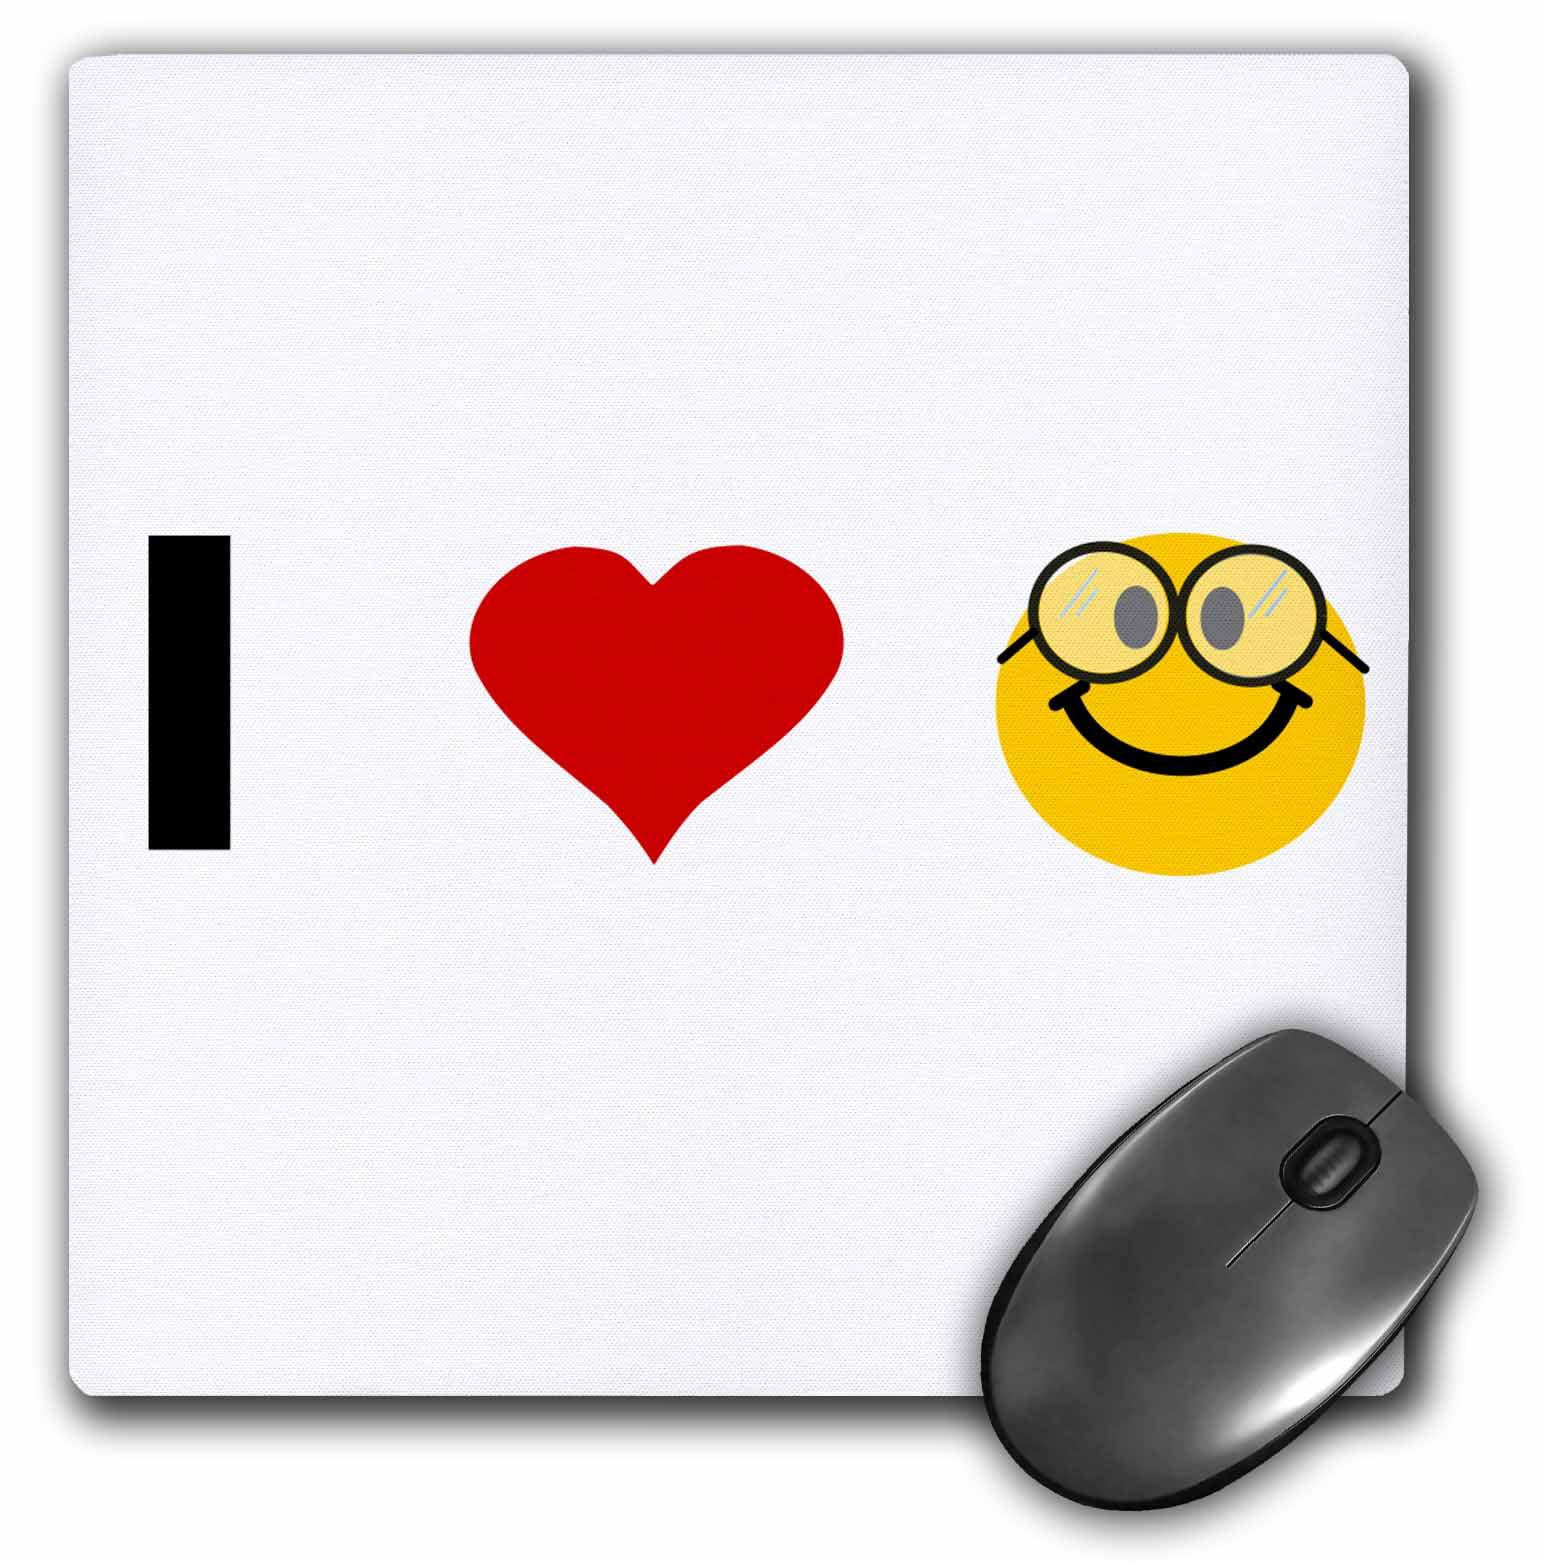 3drose i love heart geeks cute geeky nerdy smiley face